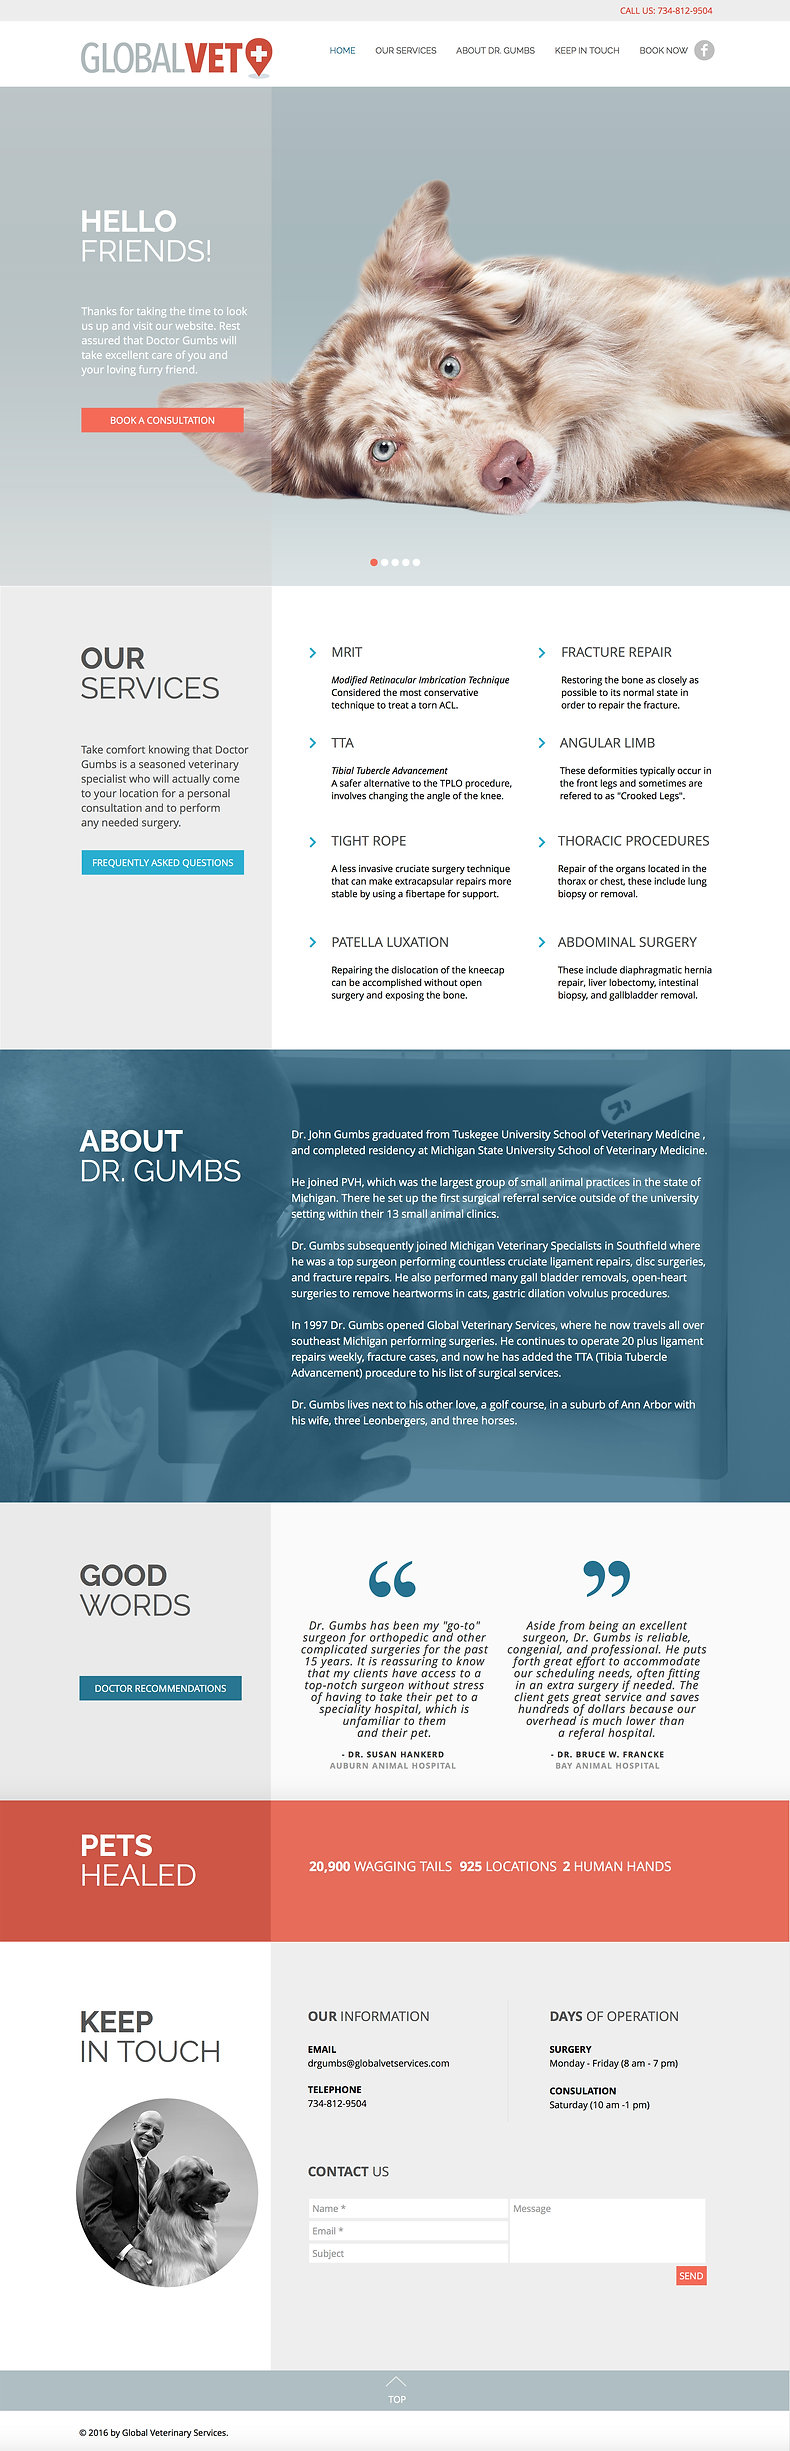 Design_GlobalVet_Website_DesktopView_Hom